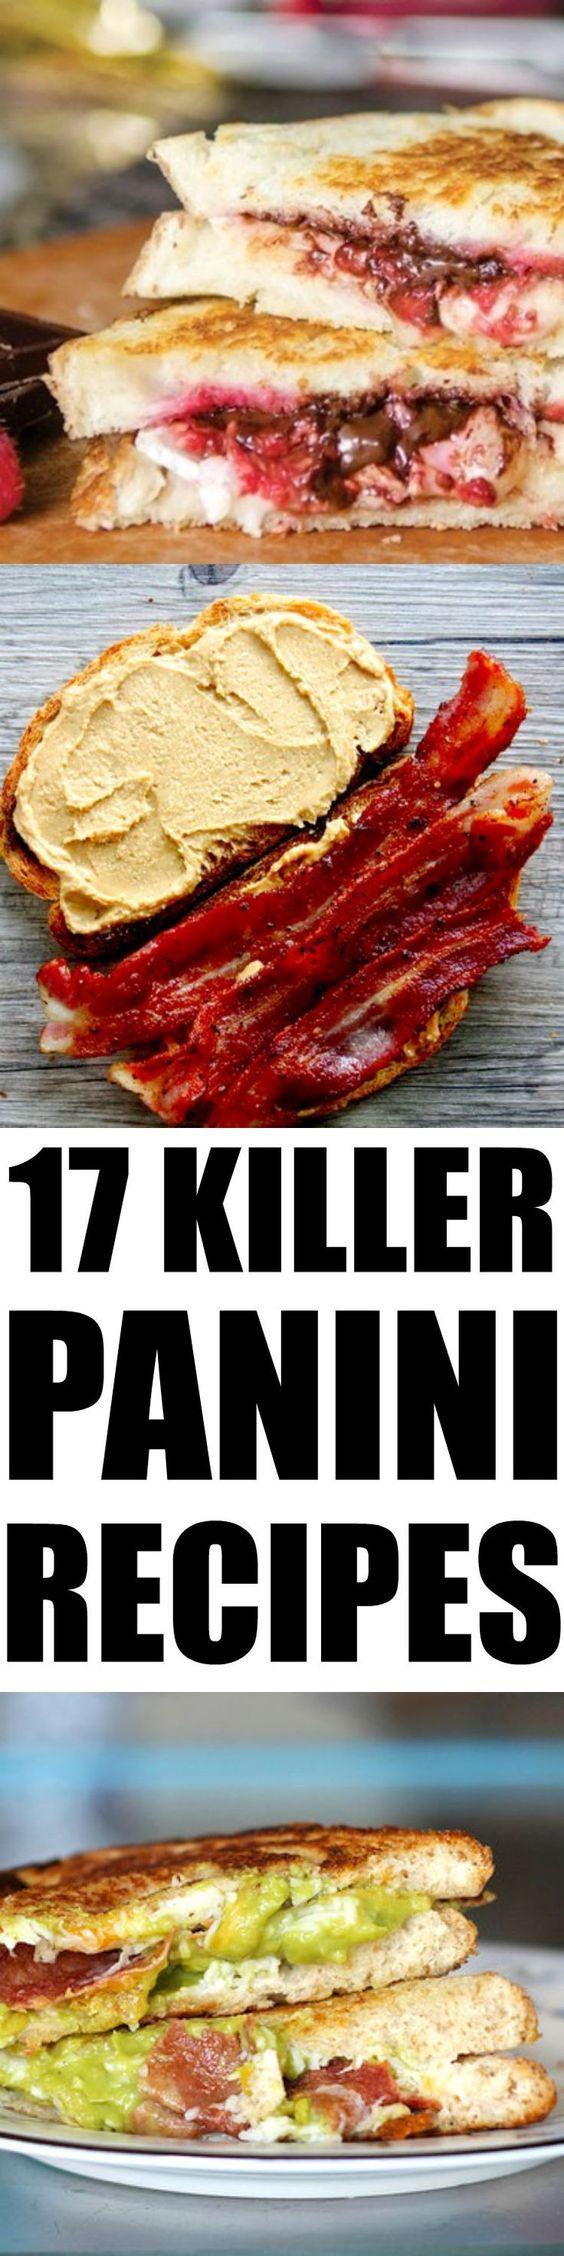 17 killer panini recipes #lunchideas #recipes #paninis